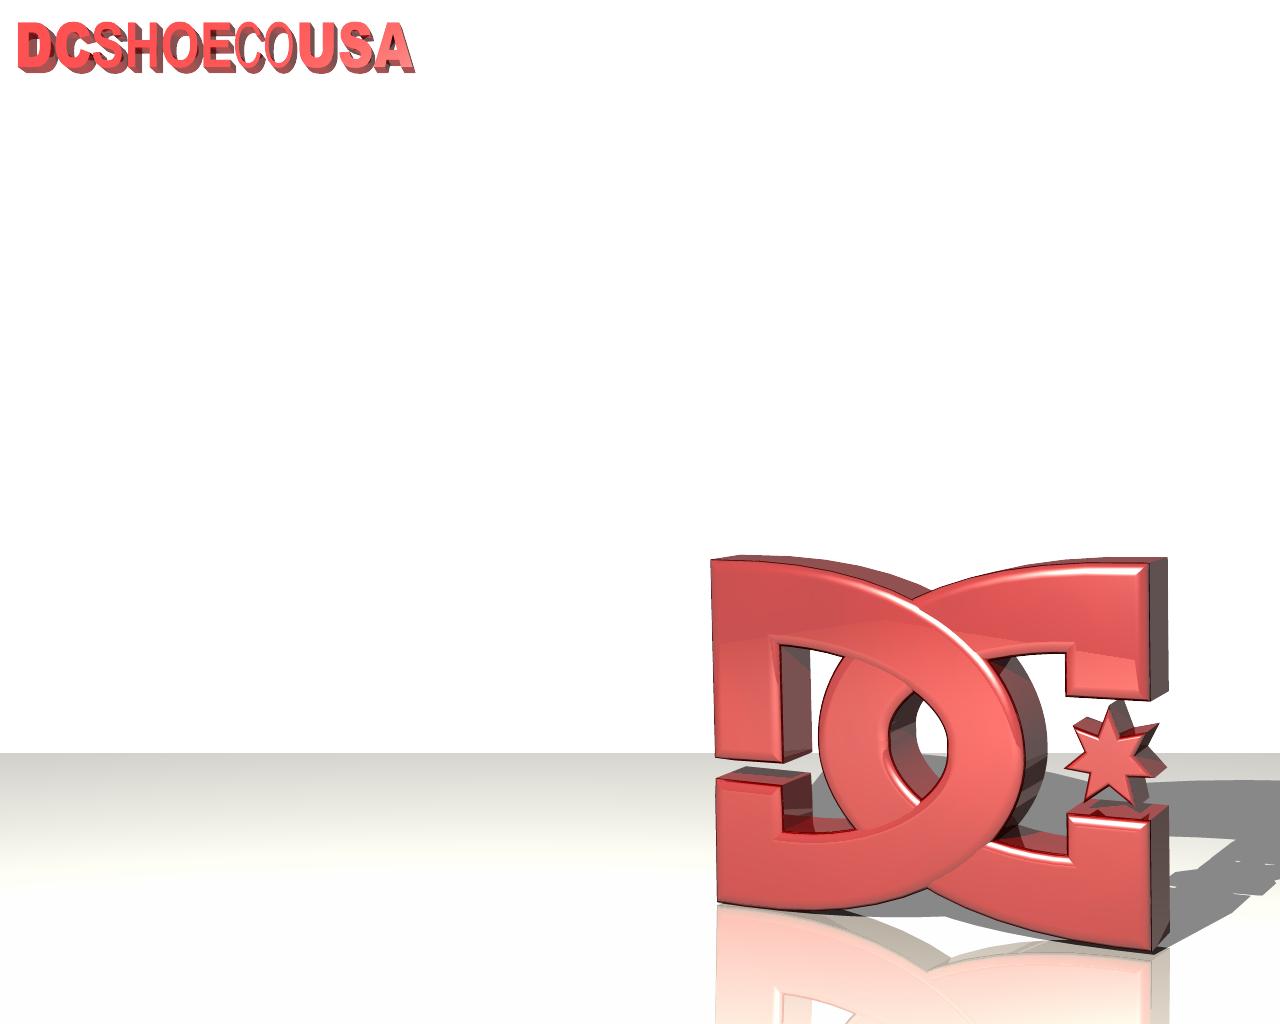 DC Shoes Red Logo in Corner White Wallpaper HD Desktop High Quality 1280x1024